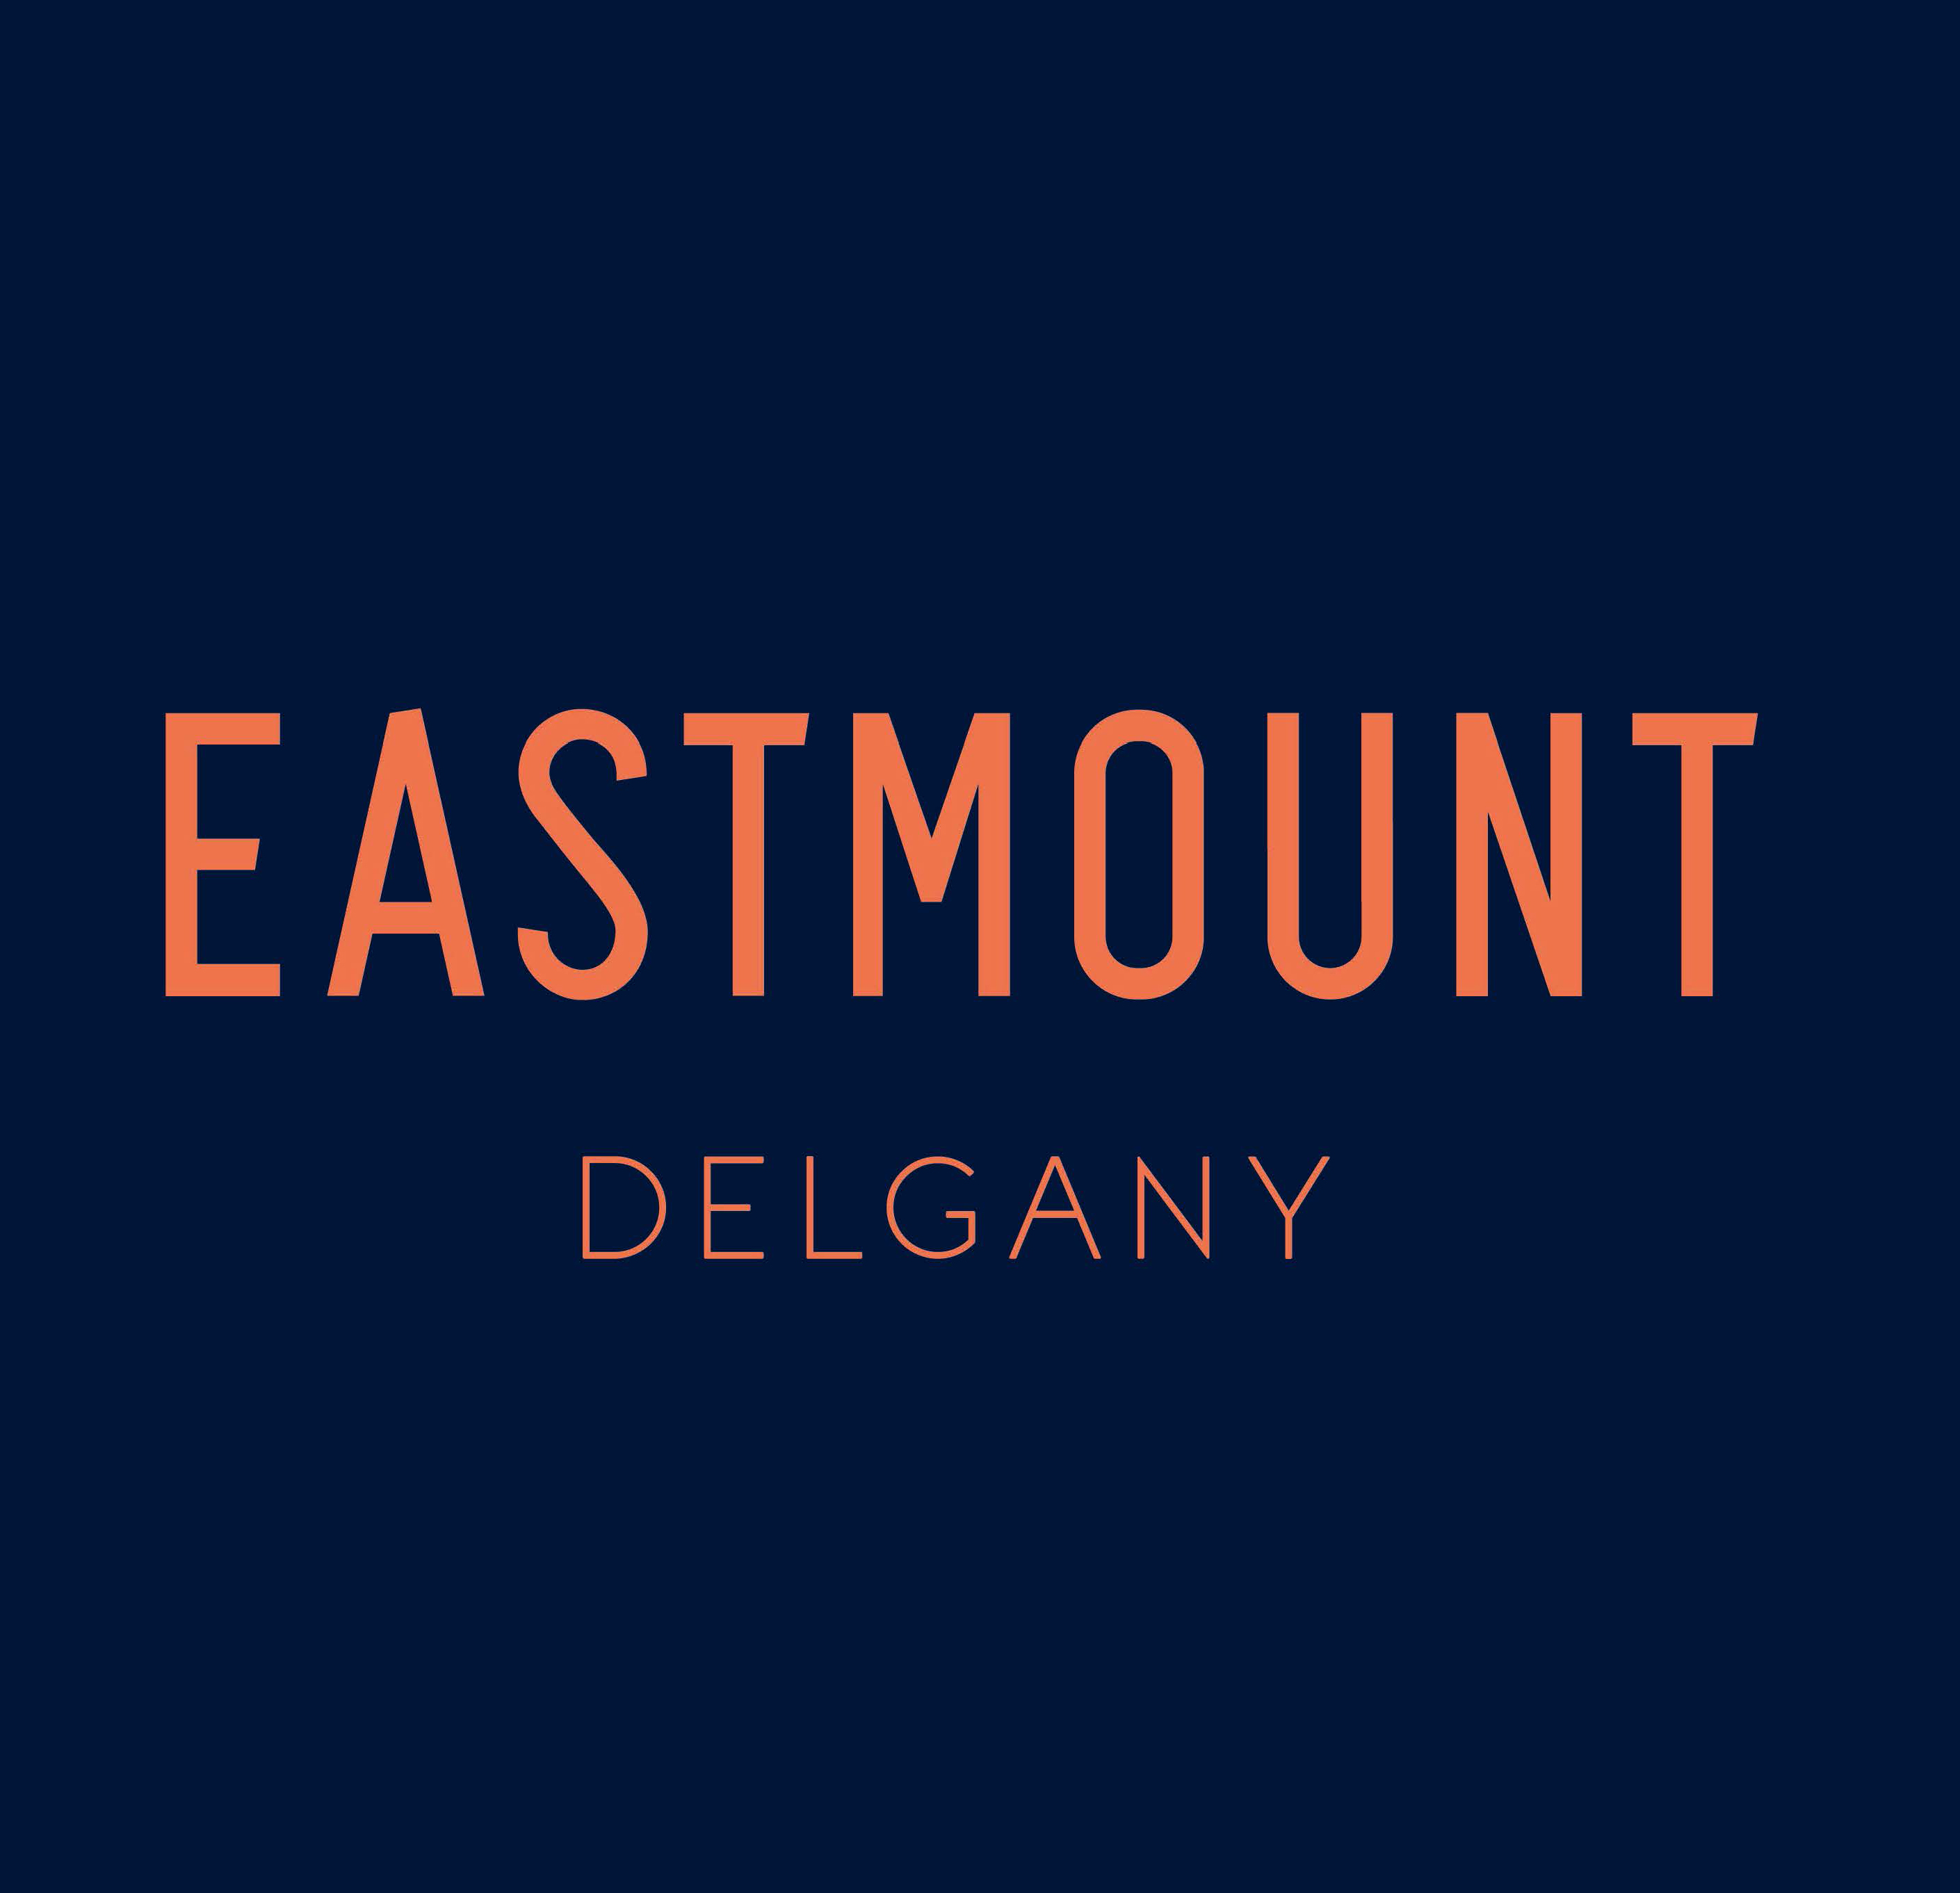 Eastmount Delgany